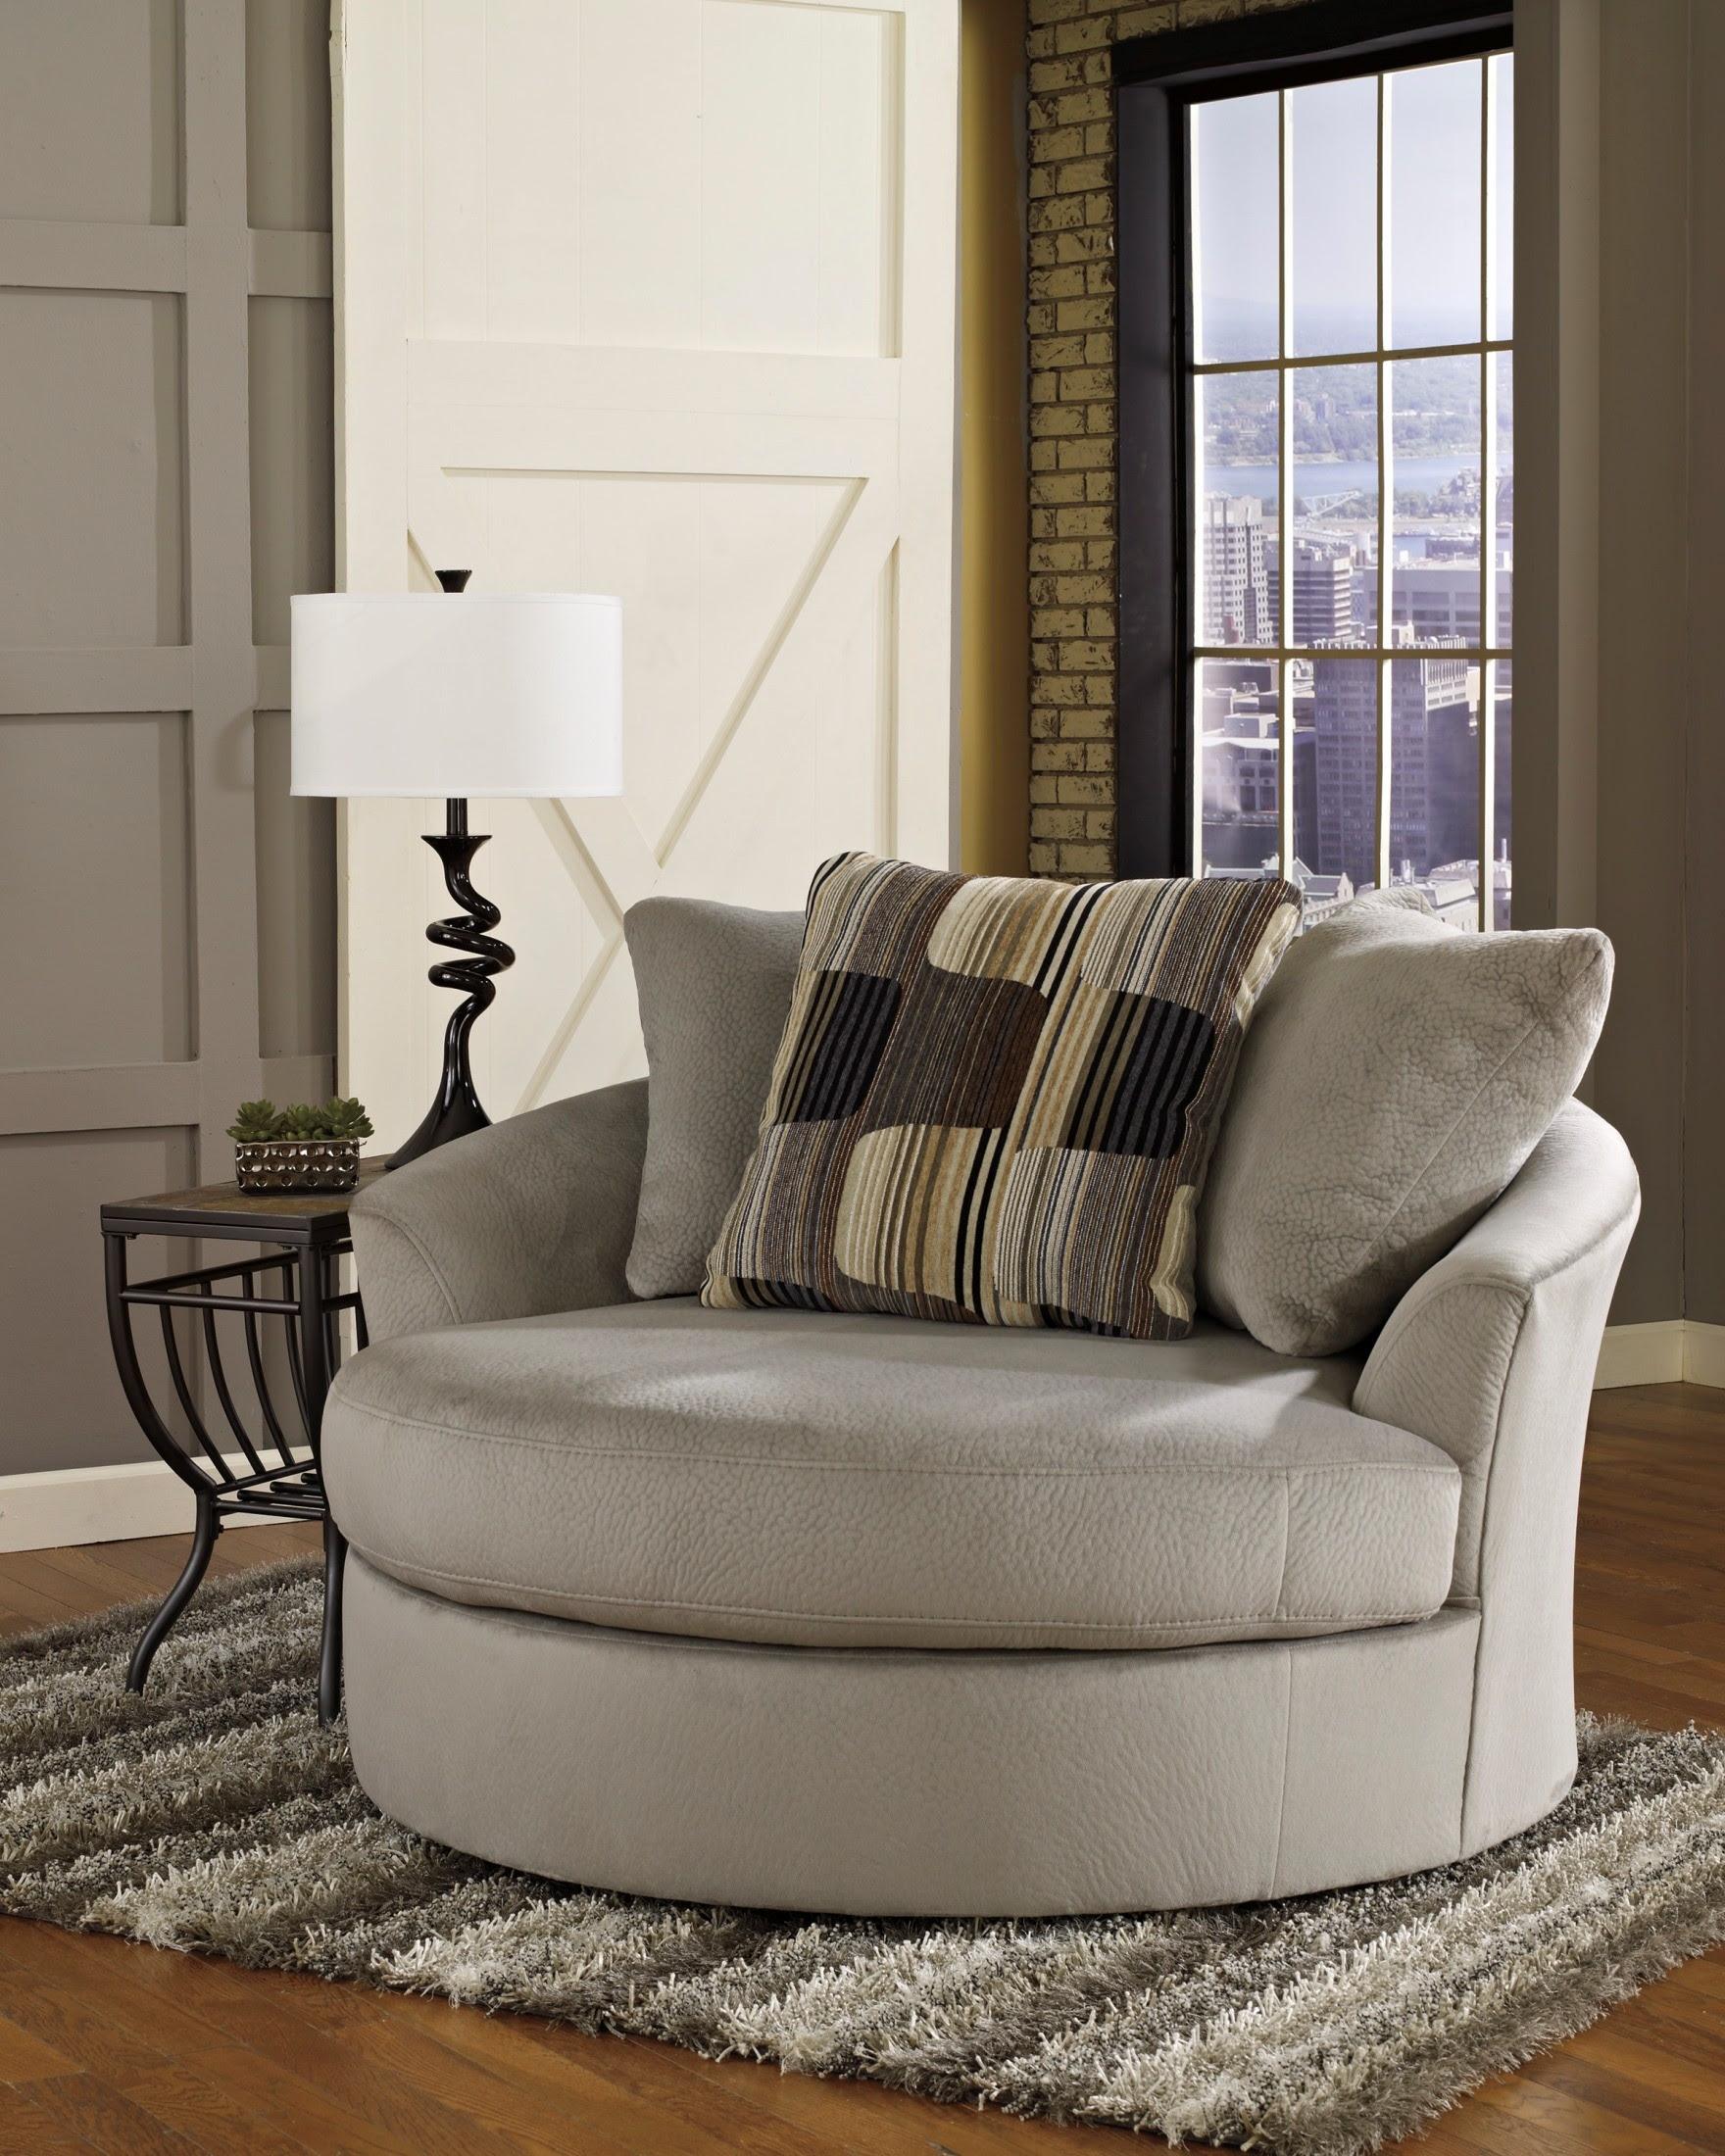 Westen Granite Oversized Swivel Accent Chair, 1950121 ...